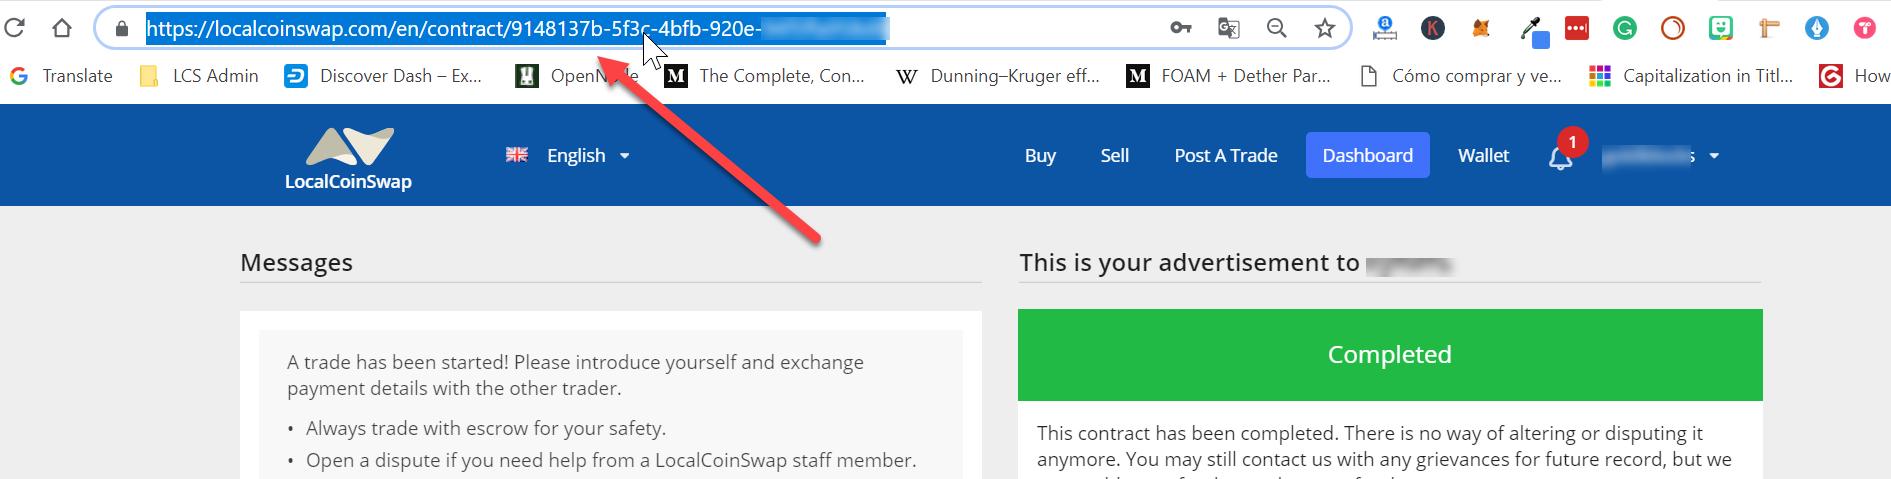 finding a trade URL on LocalCoinSwap